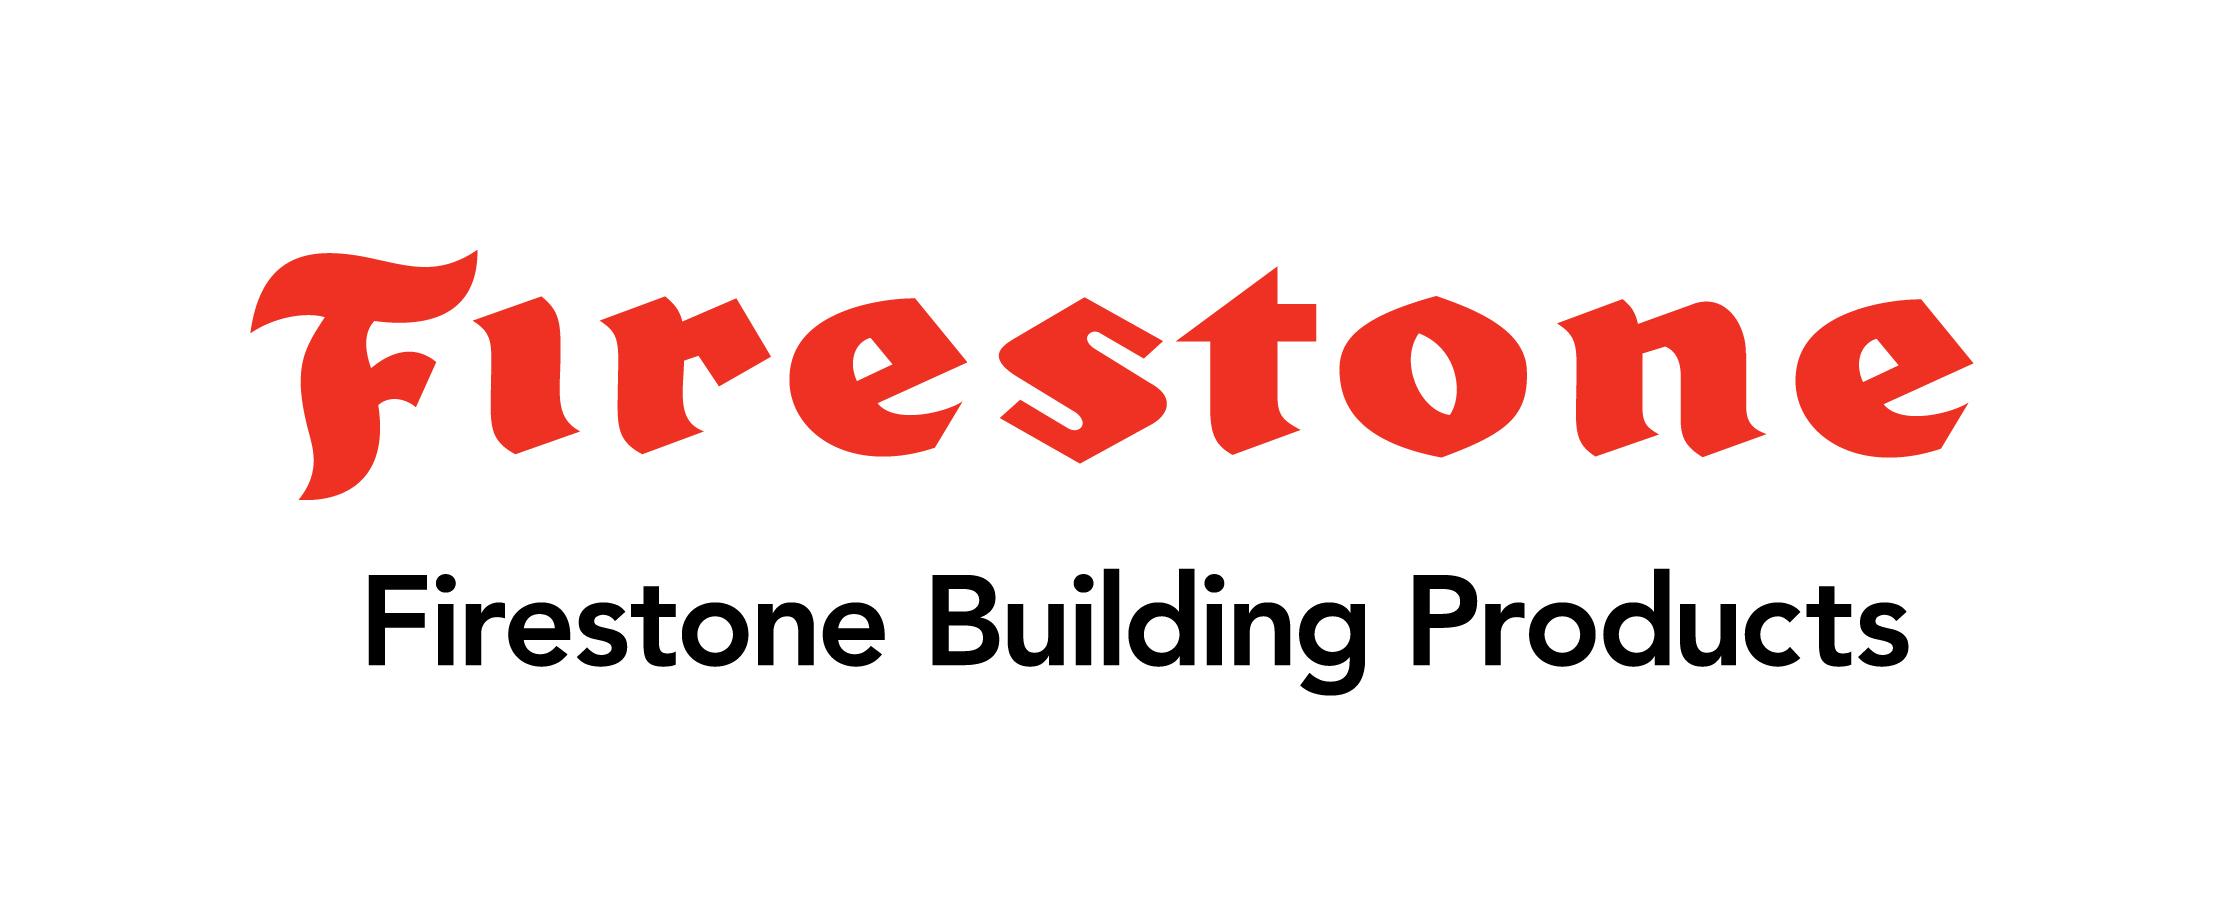 Bridgestone Brands Logos - Firestone Logo PNG